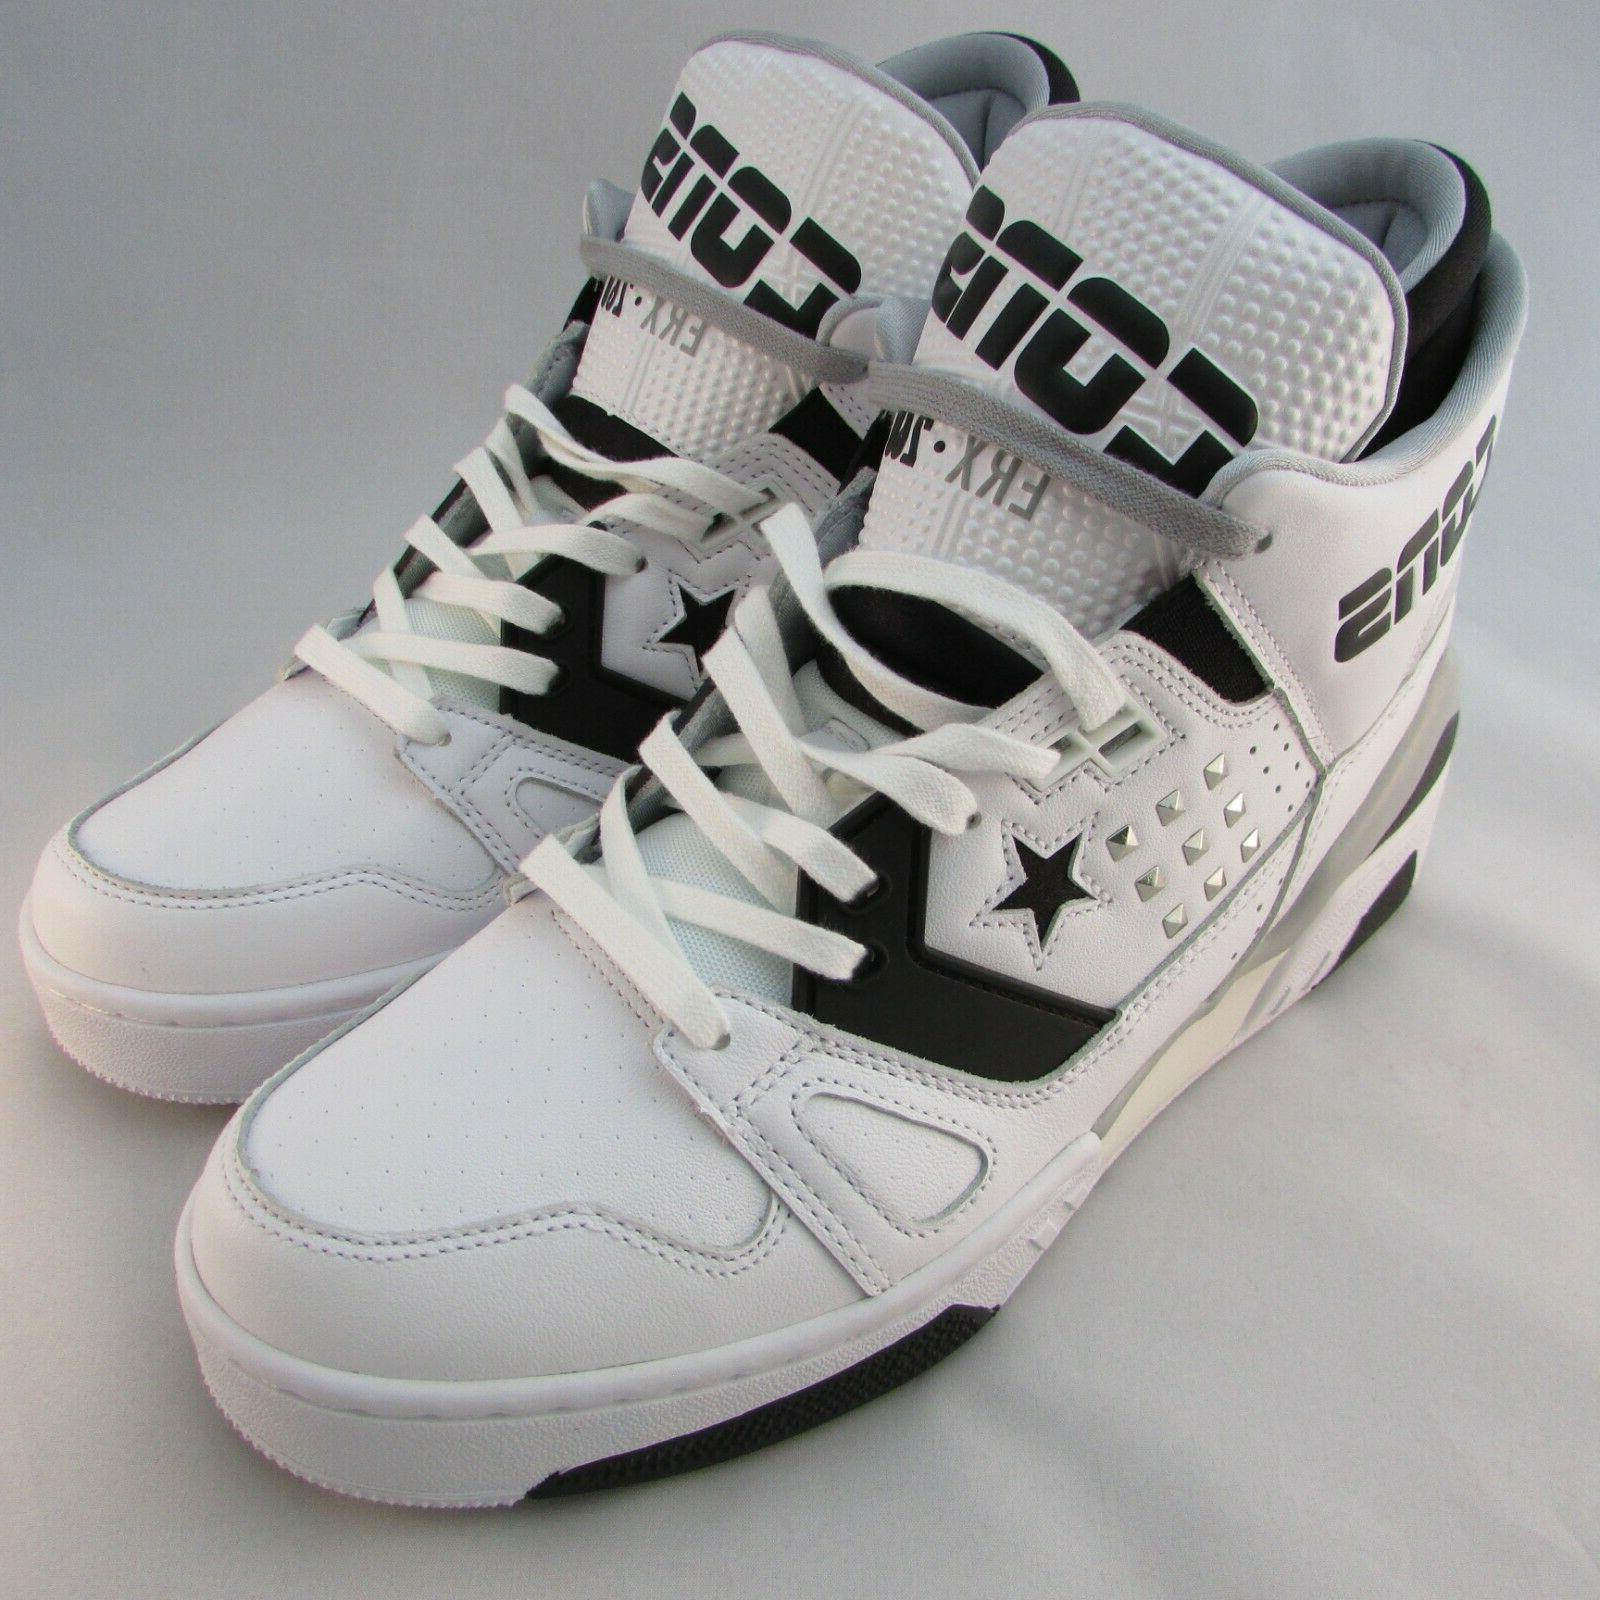 Converse ERX White Shoes